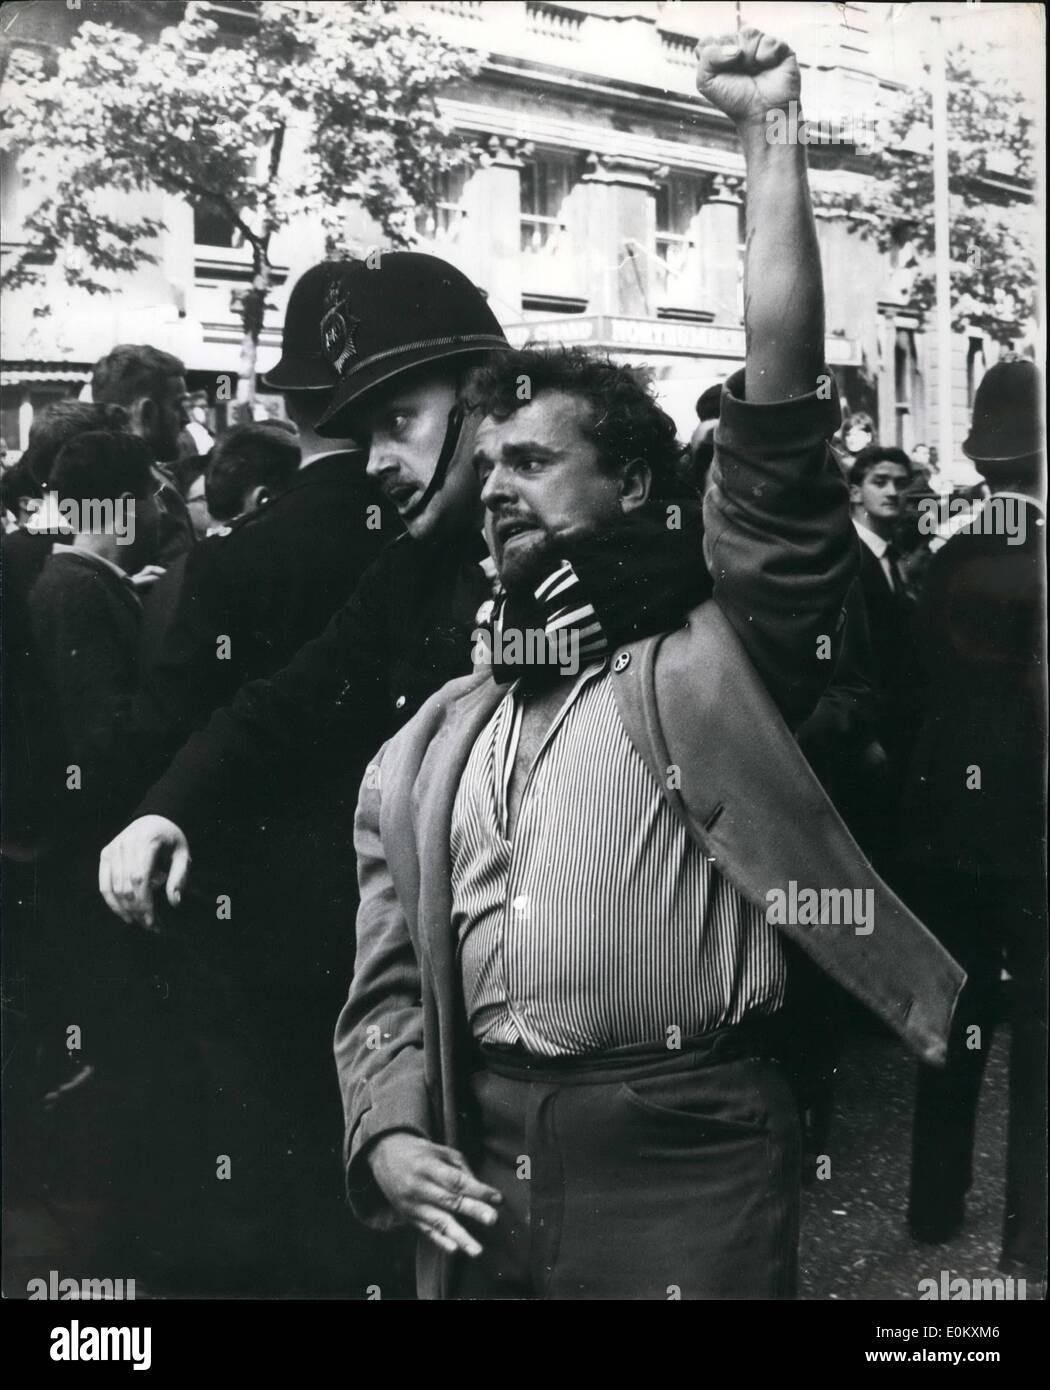 Jul. 07, 1952 - Reds Break up British Fascist Meeting.: Communist's broke-up a meeting of the Union Movement (British Fascists) - Stock Image